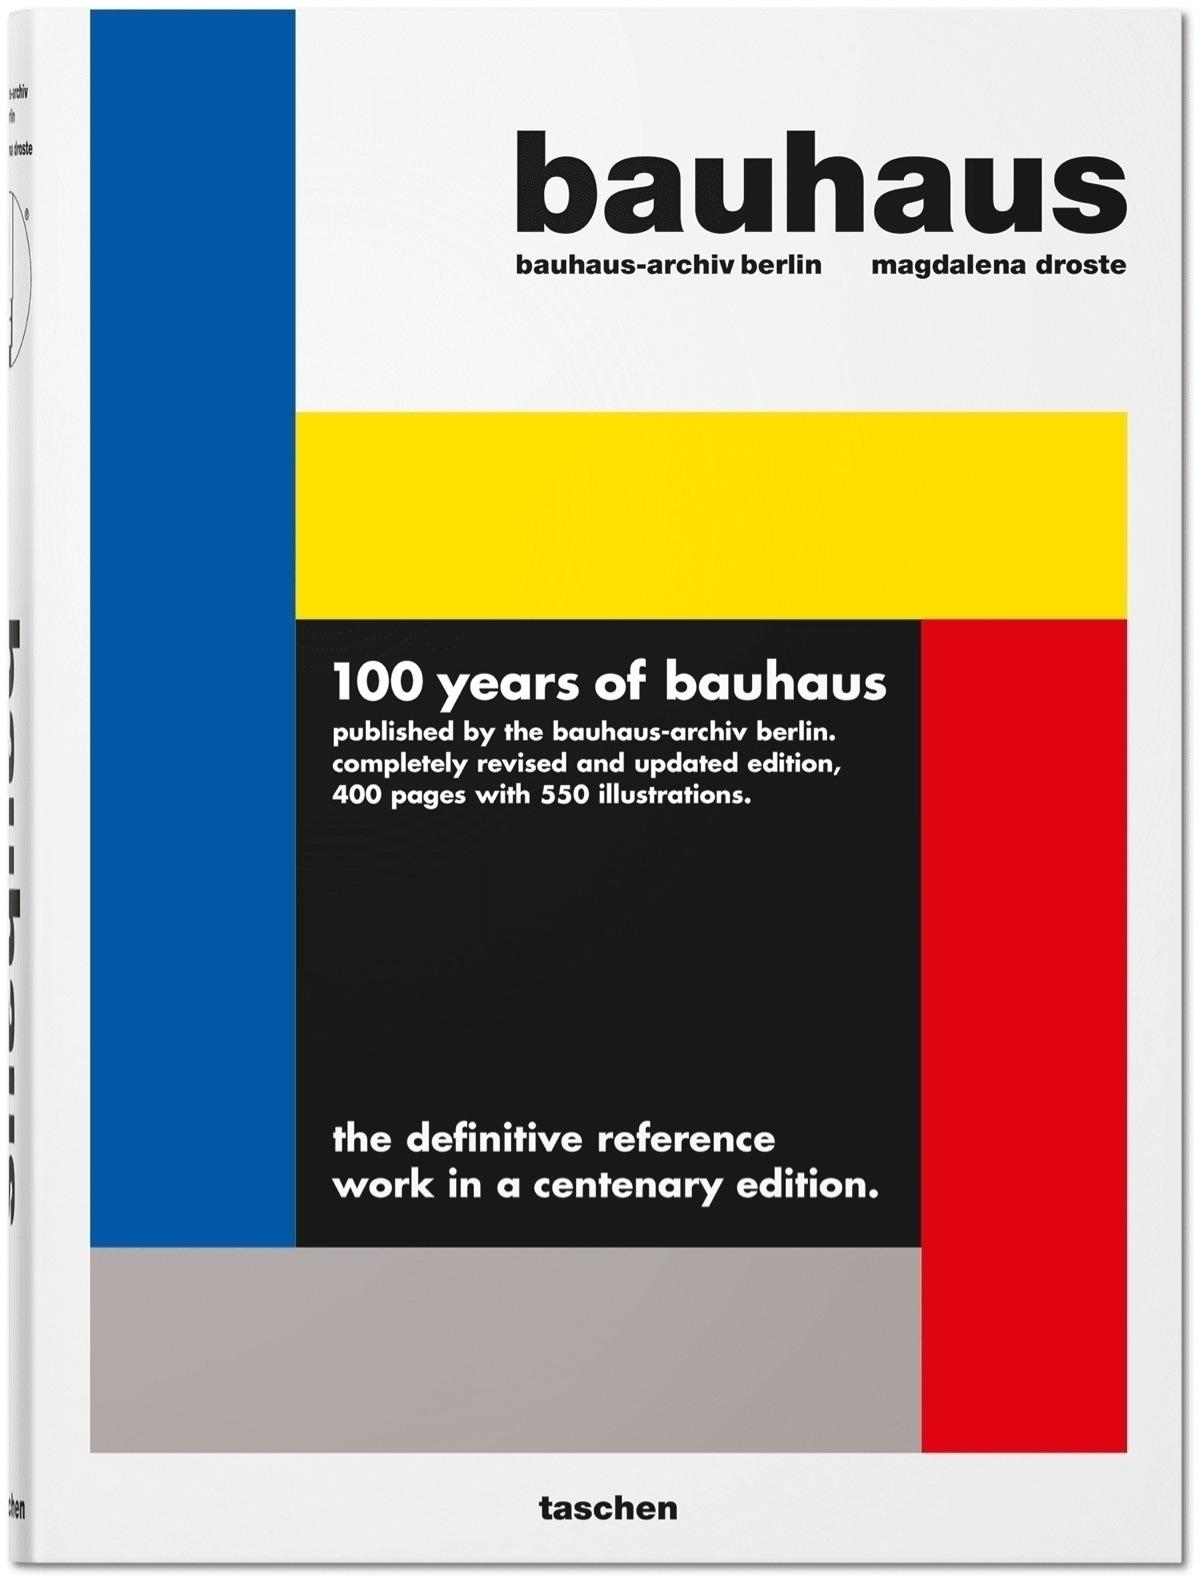 100 years collaboration Bauhaus - bauhaus-movement | ello